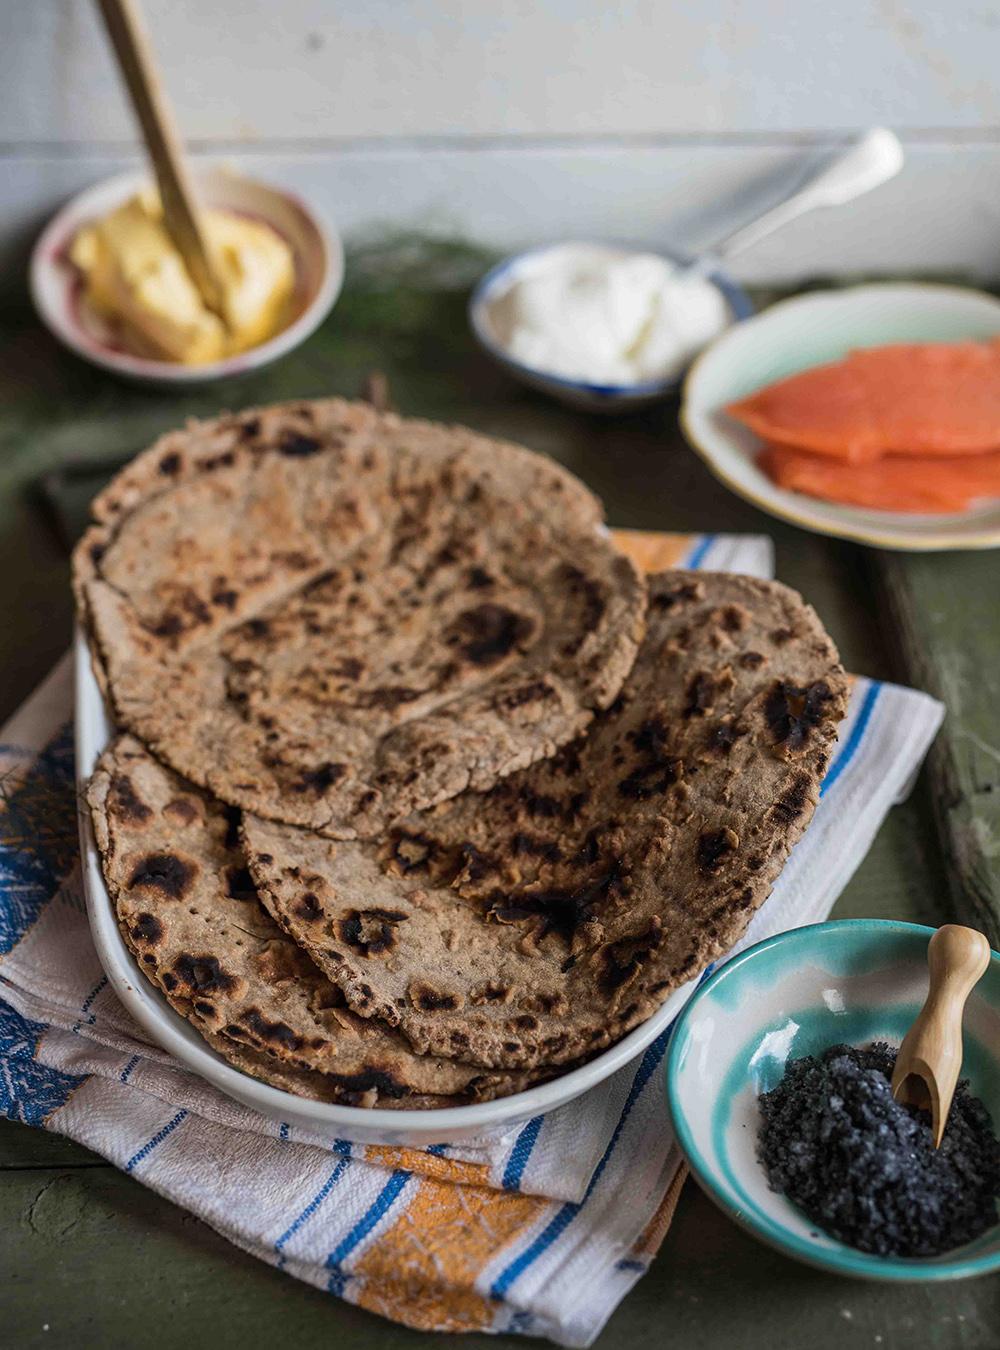 Traditionelles Roggen Flatbread aus Island - Flatbrauð